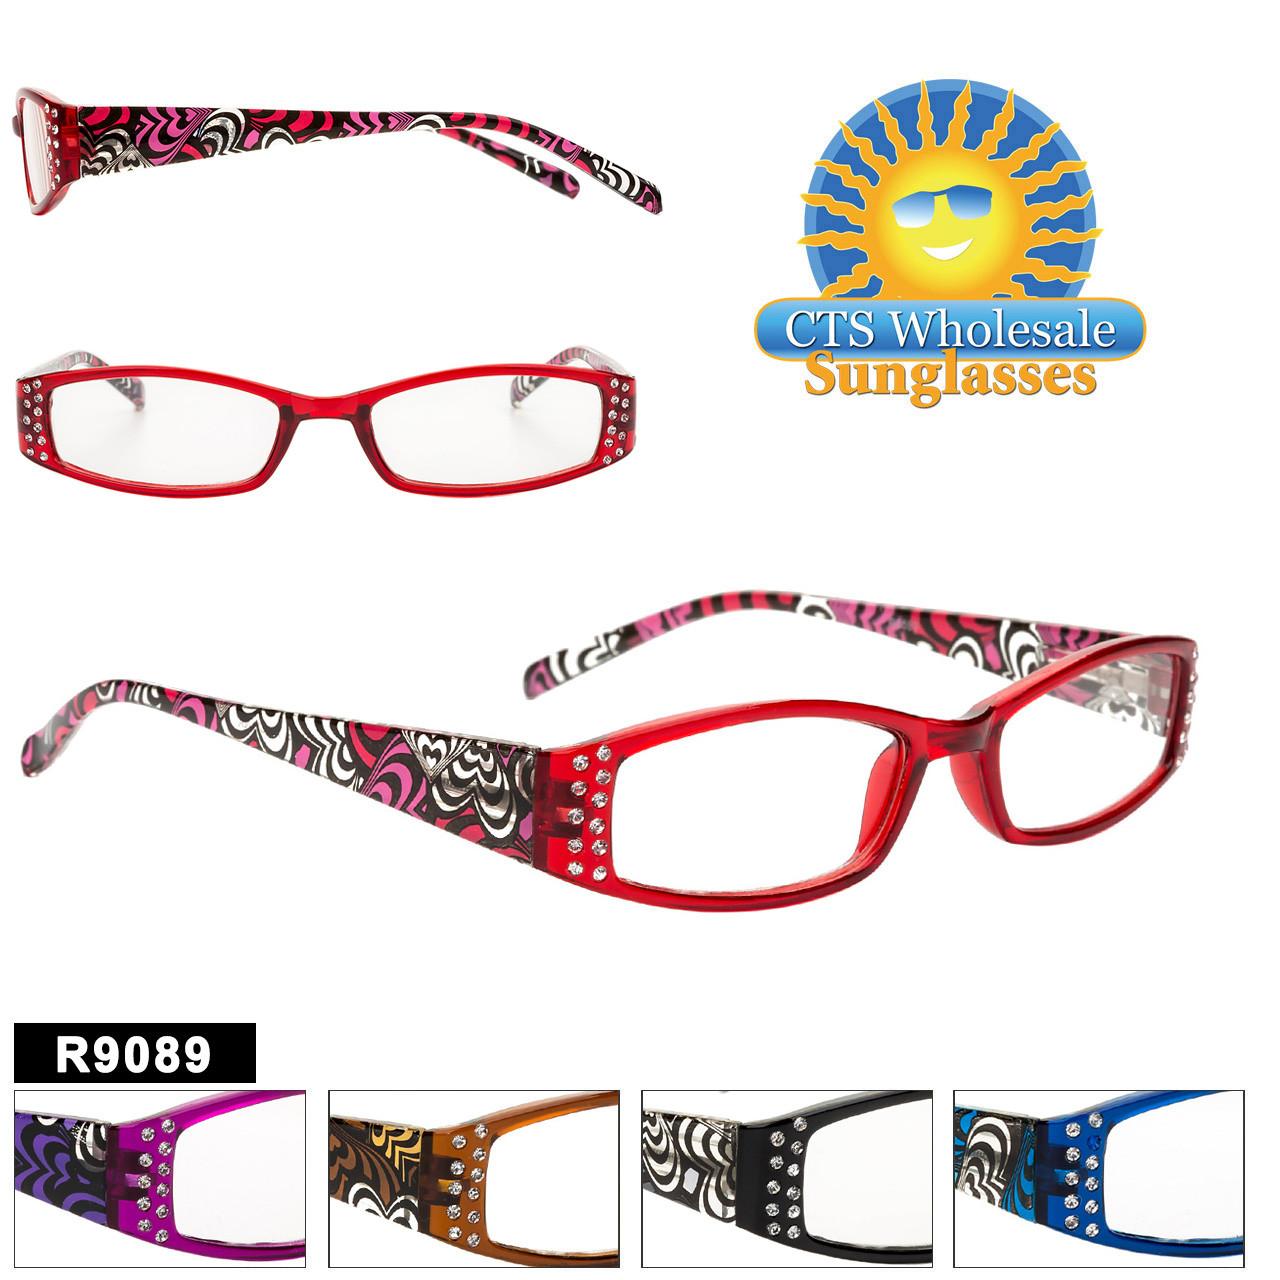 Wholesale Reading Glasses - R9089